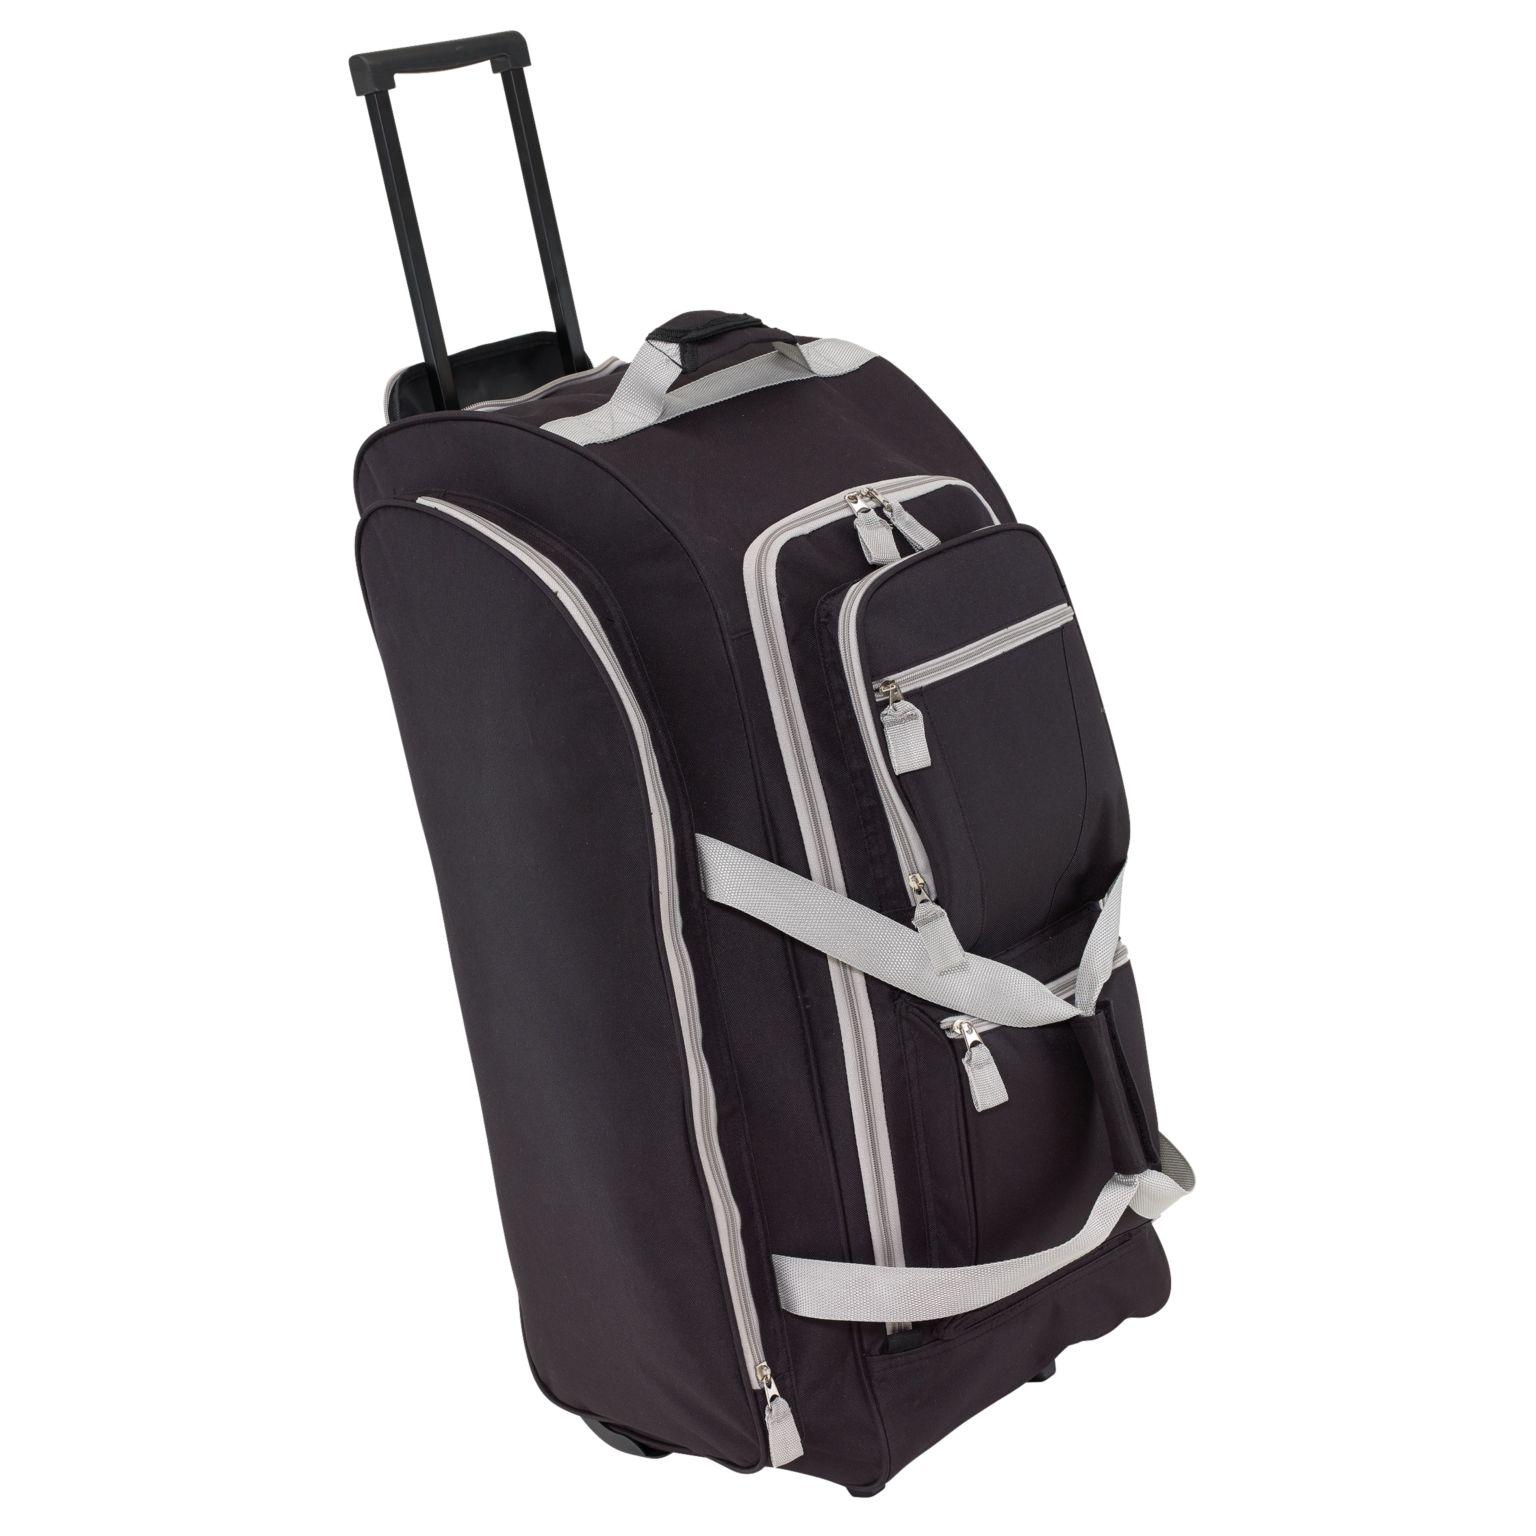 Trolley travel bag 9P